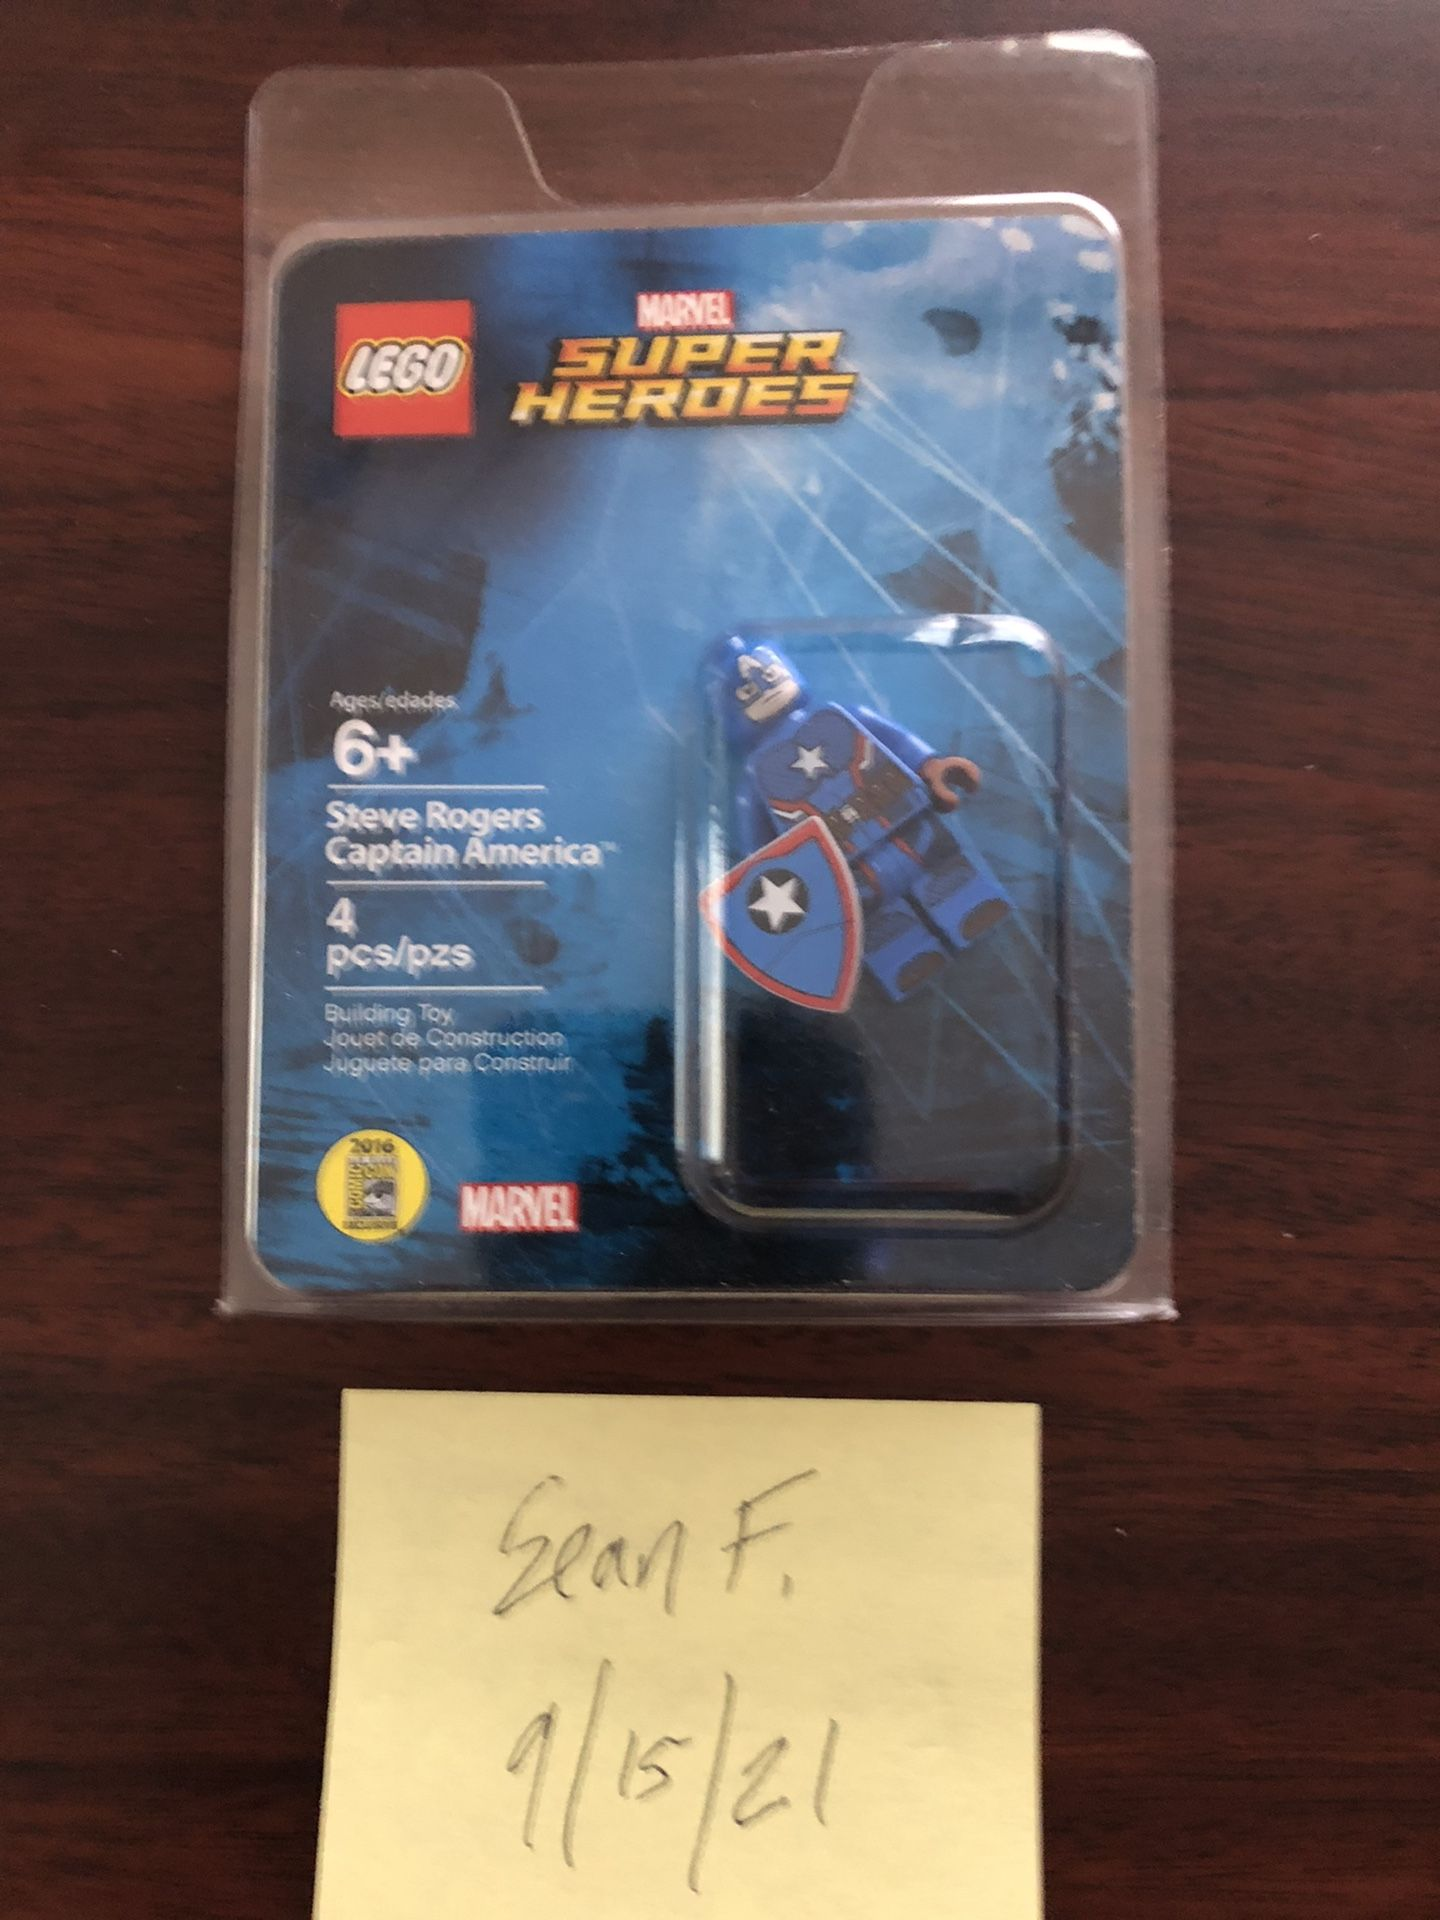 Lego SDCC Steve Rodgers/ Captain America  minifigure